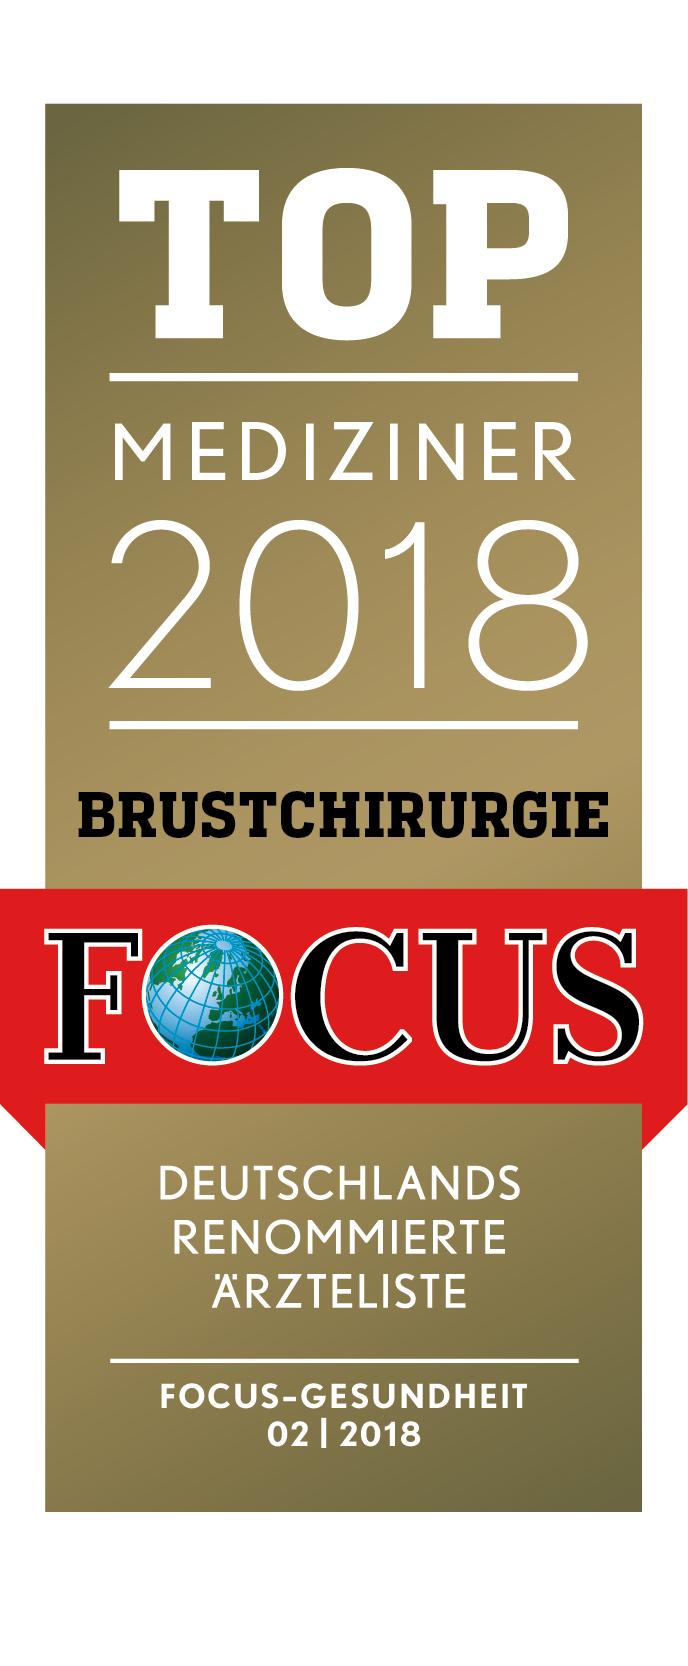 FOCUS Topmediziner Brustchirurgie 2018